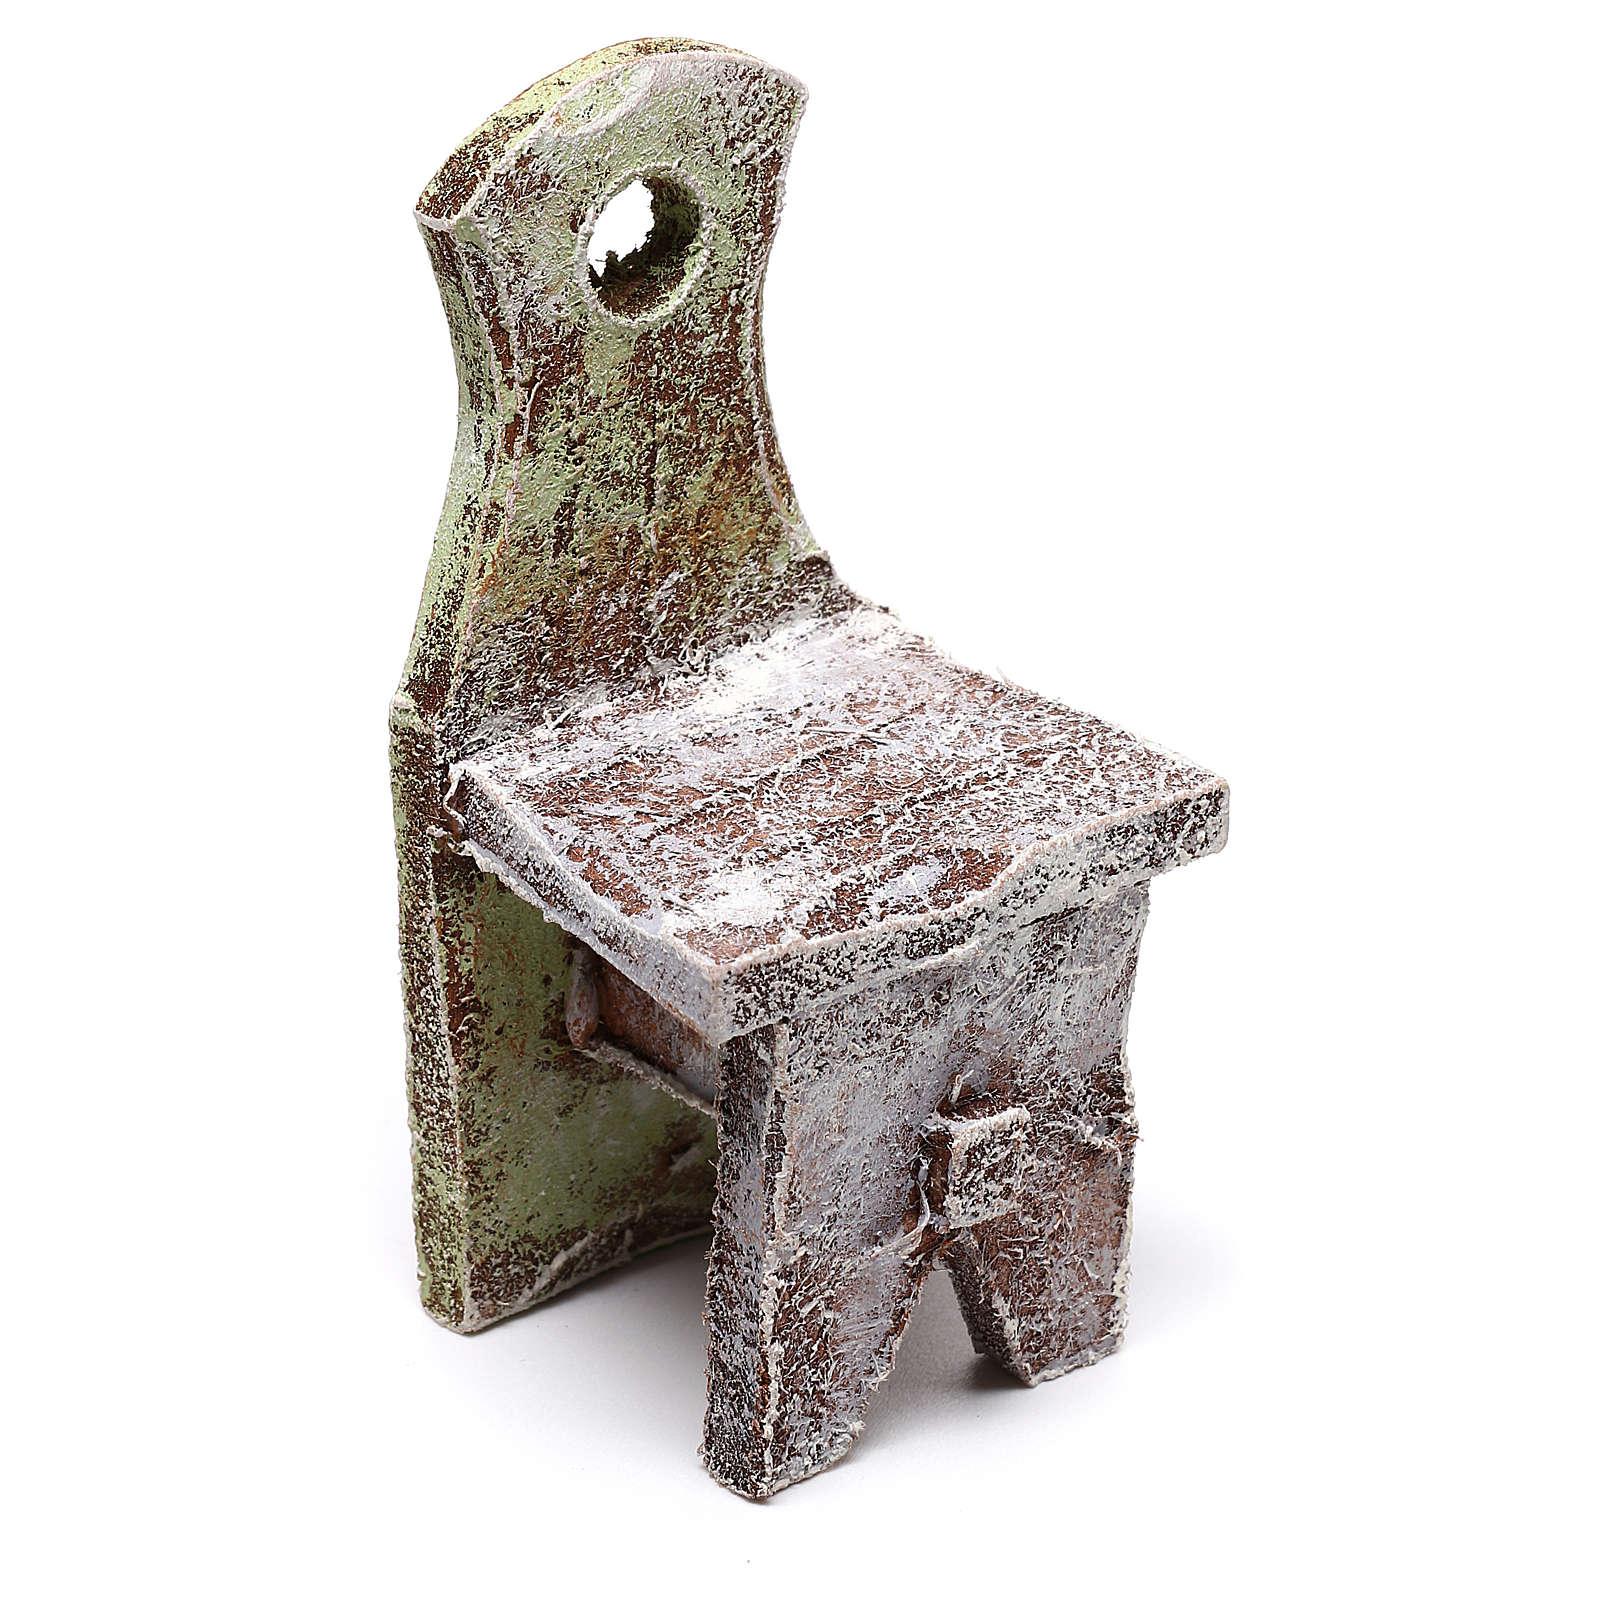 Chair figurine 5x5x5 cm, for 12 cm nativity 4